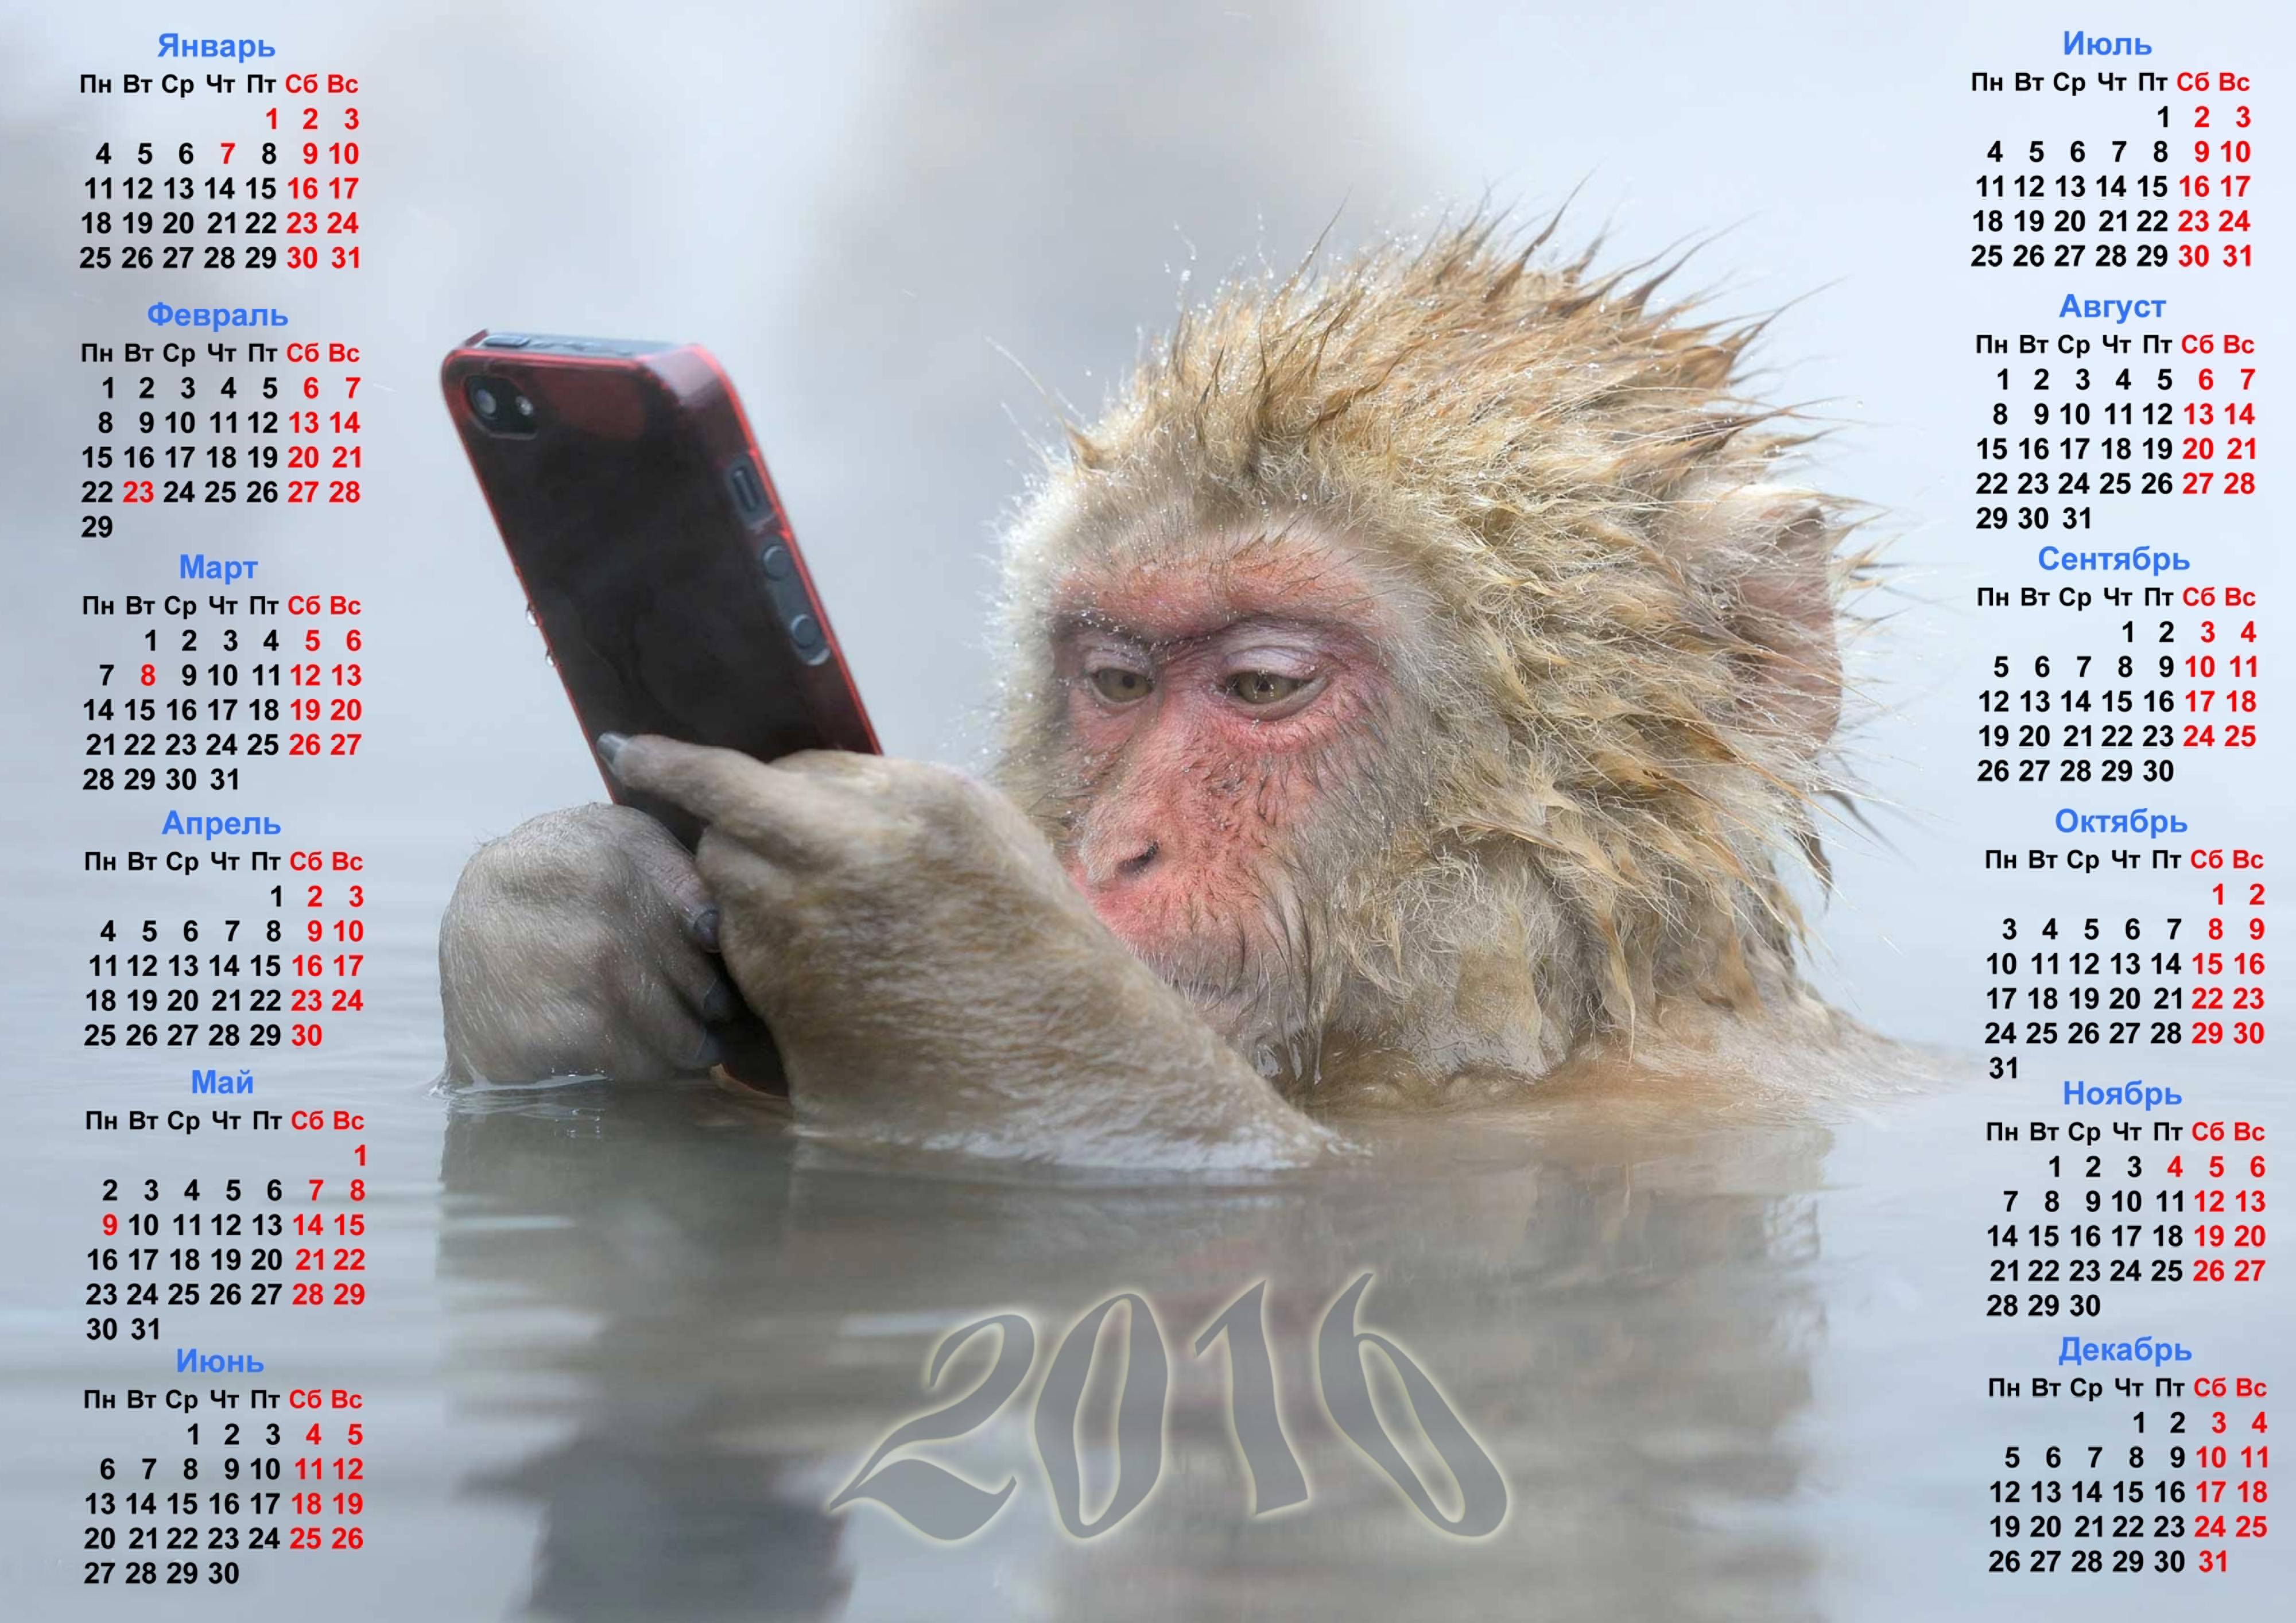 Desktop Wallpapers 2016 Monkey Calendar Animal 4000x2828 Images, Photos, Reviews